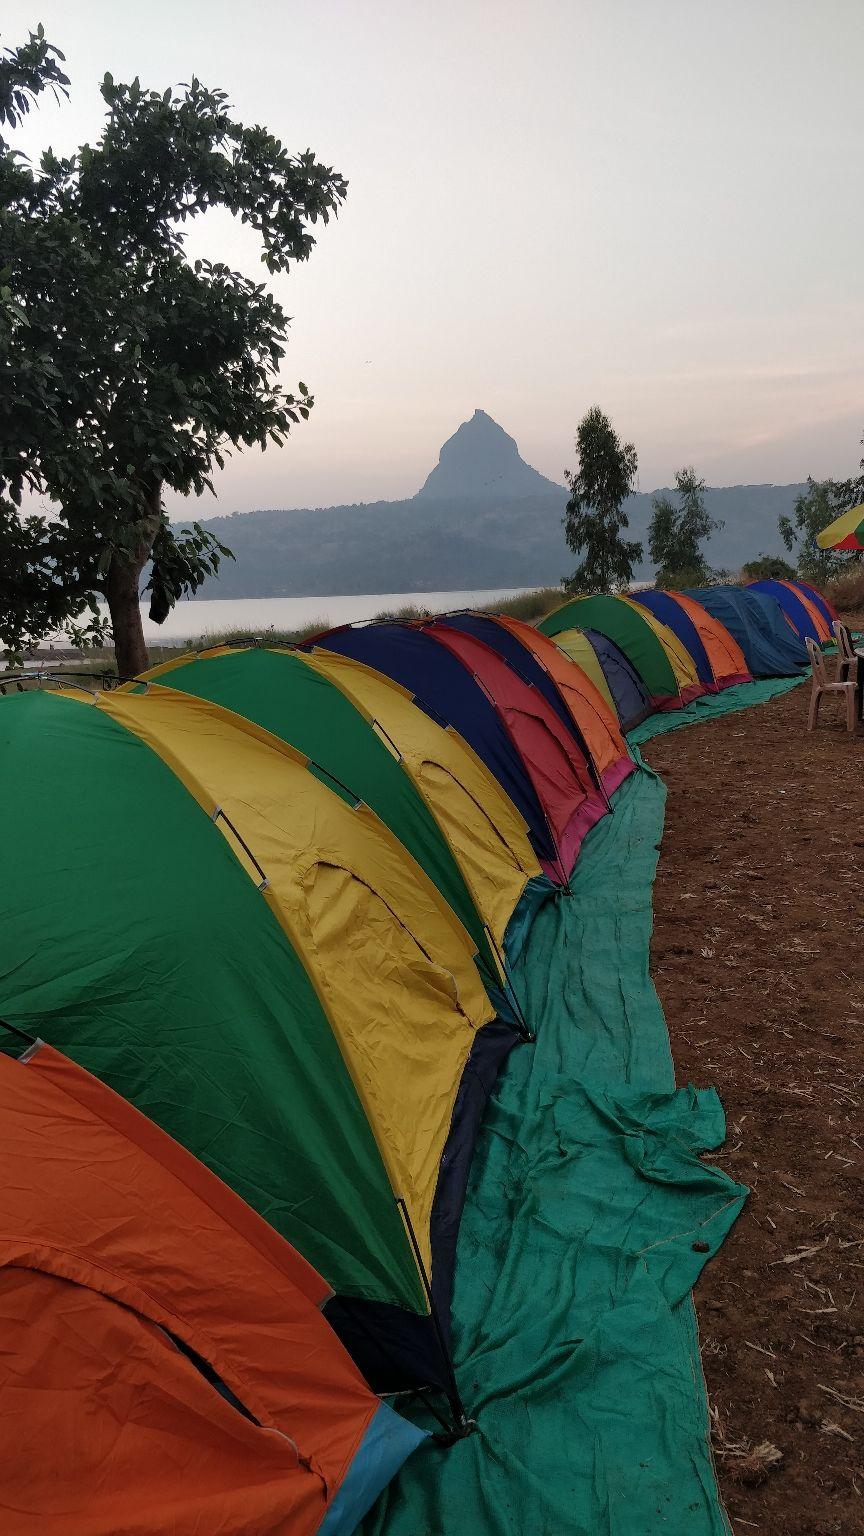 Photo of Pawna Camping By Arpit Gupta